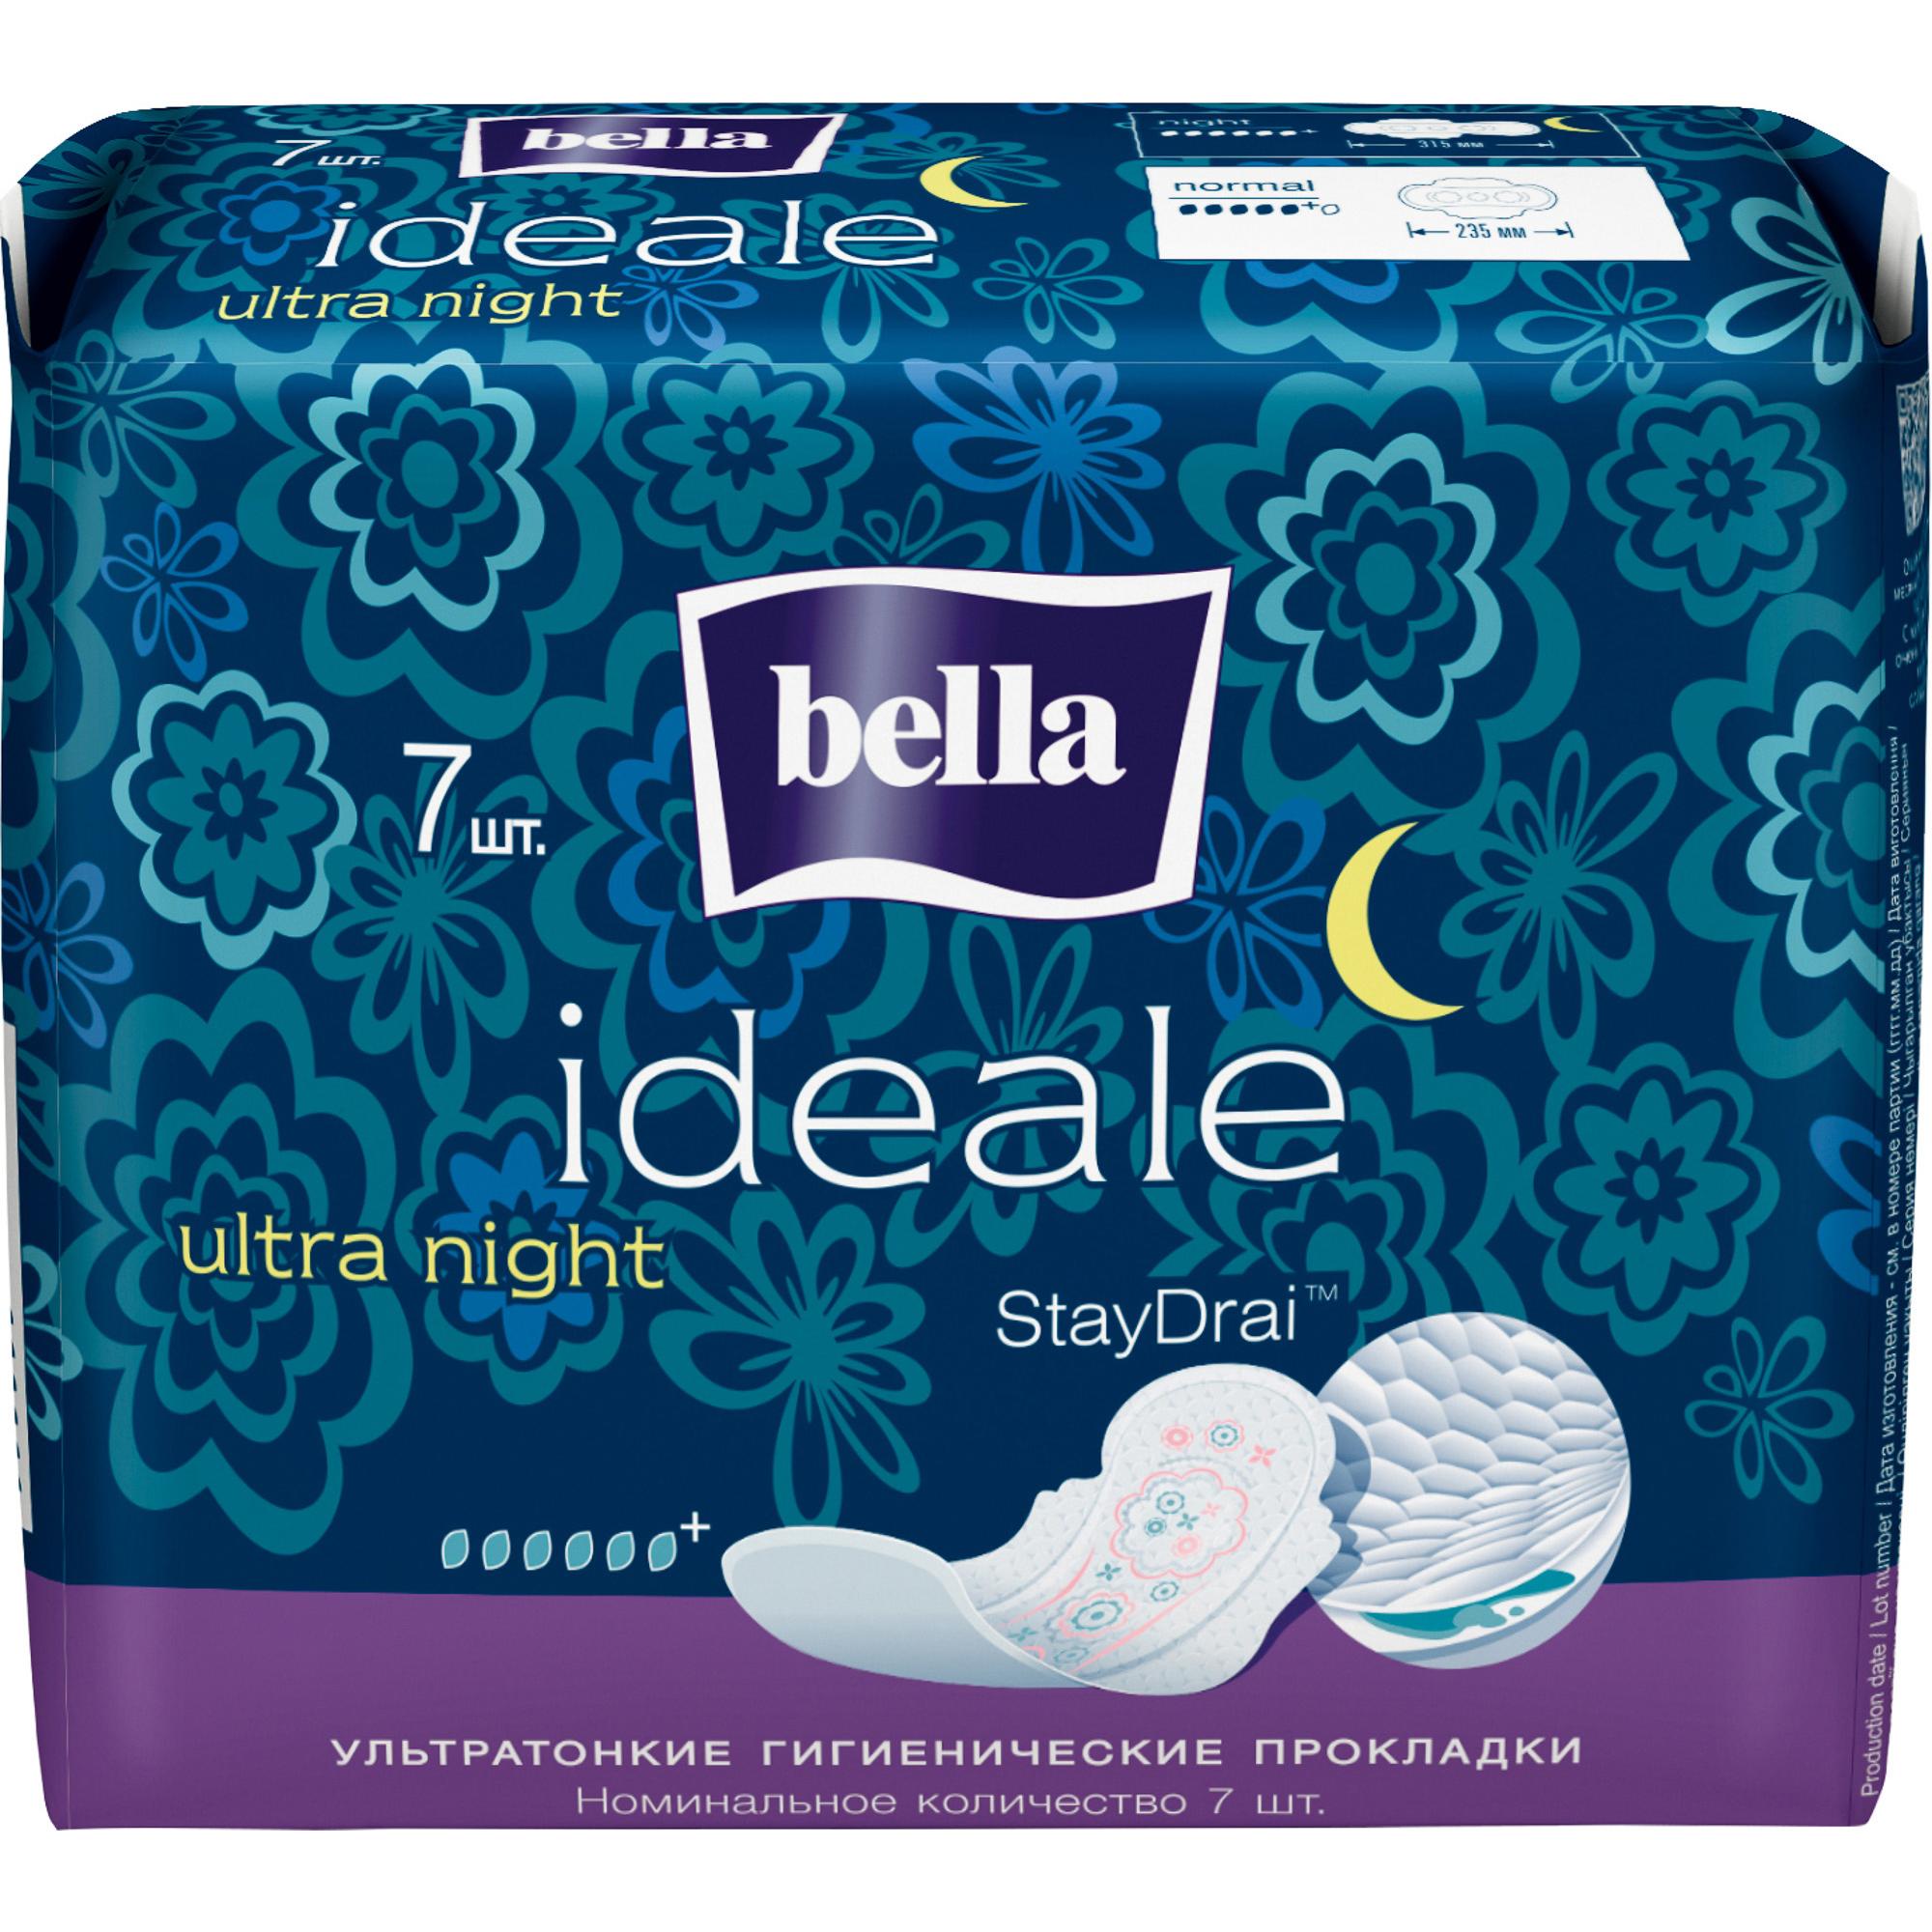 Прокладки Bella Ideale Ultra Night 7 шт.